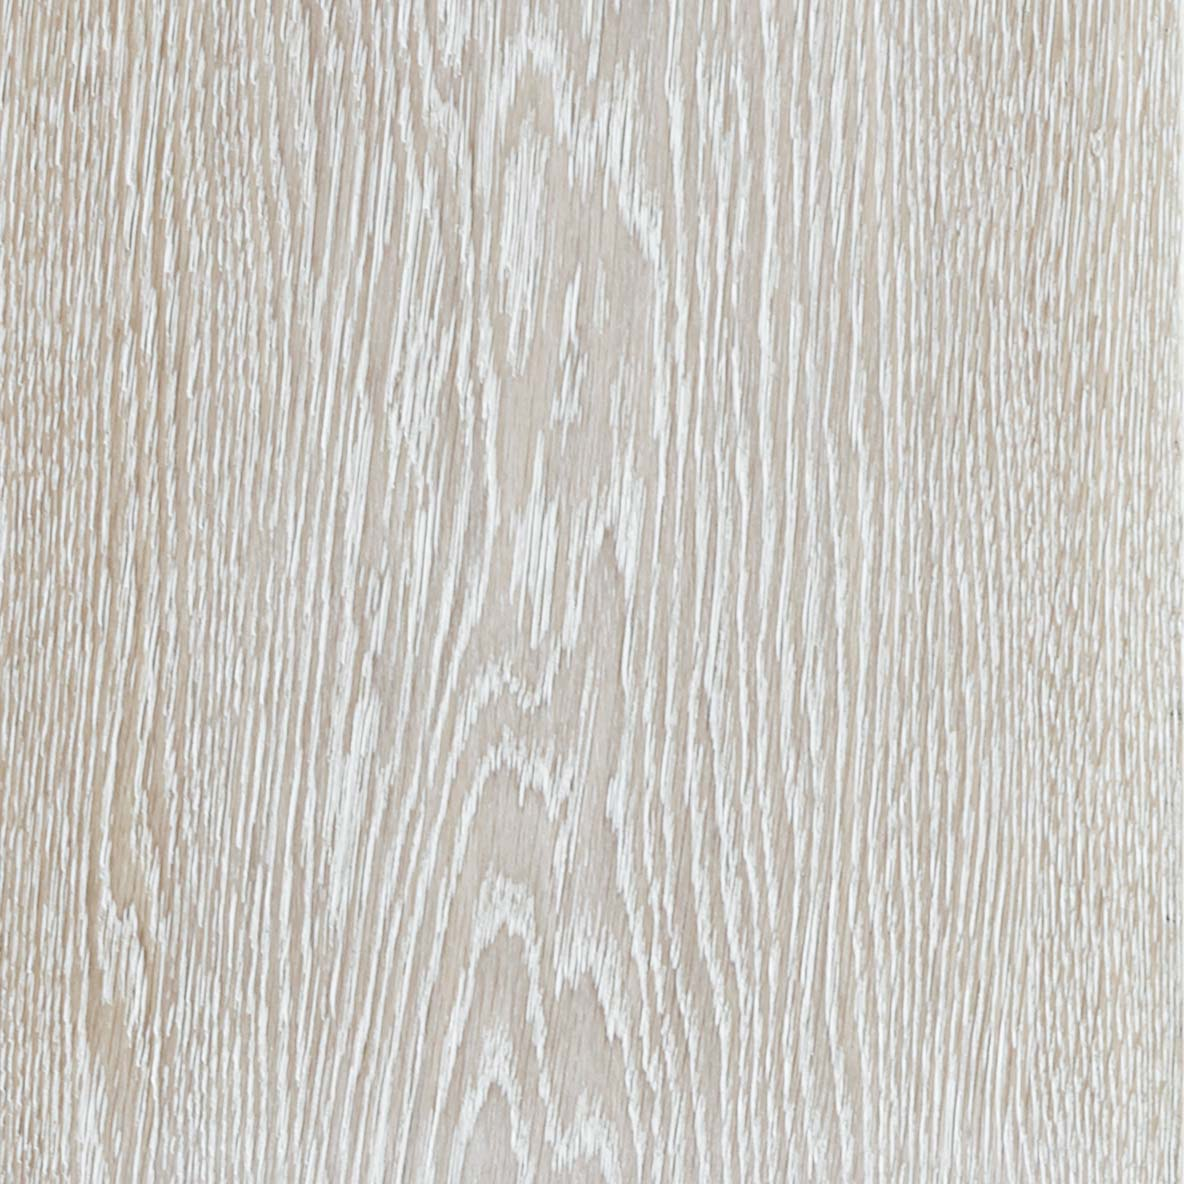 Element7-wide-plank-samples-CornichePlank_3_AJ_883_212